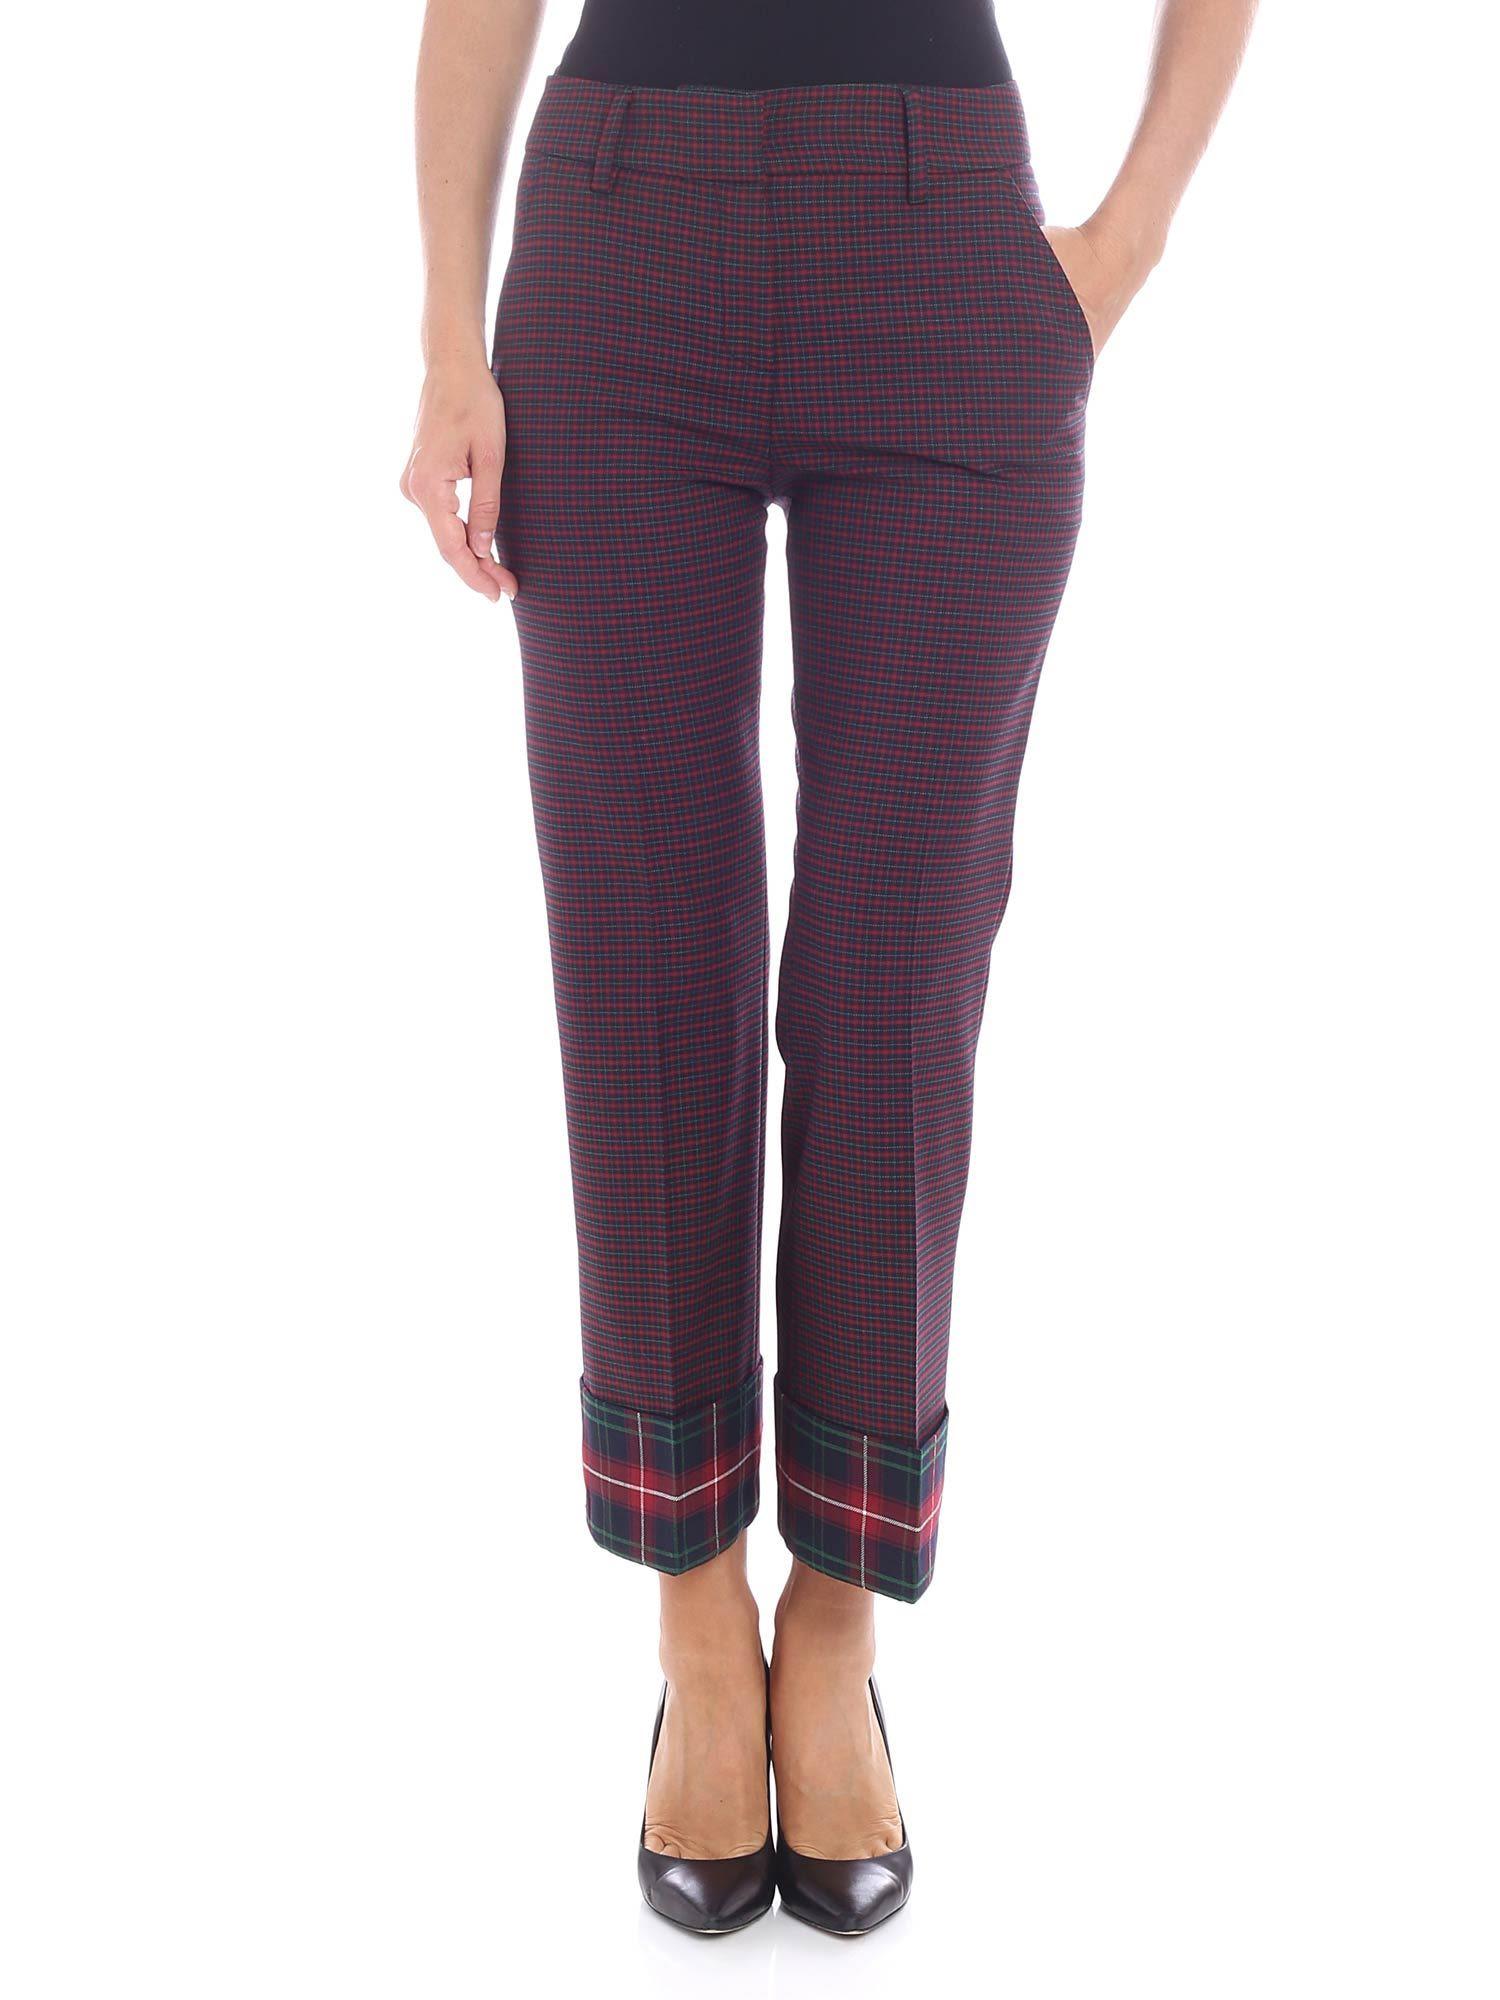 TRUE ROYAL - Mia Trousers in Scozzese